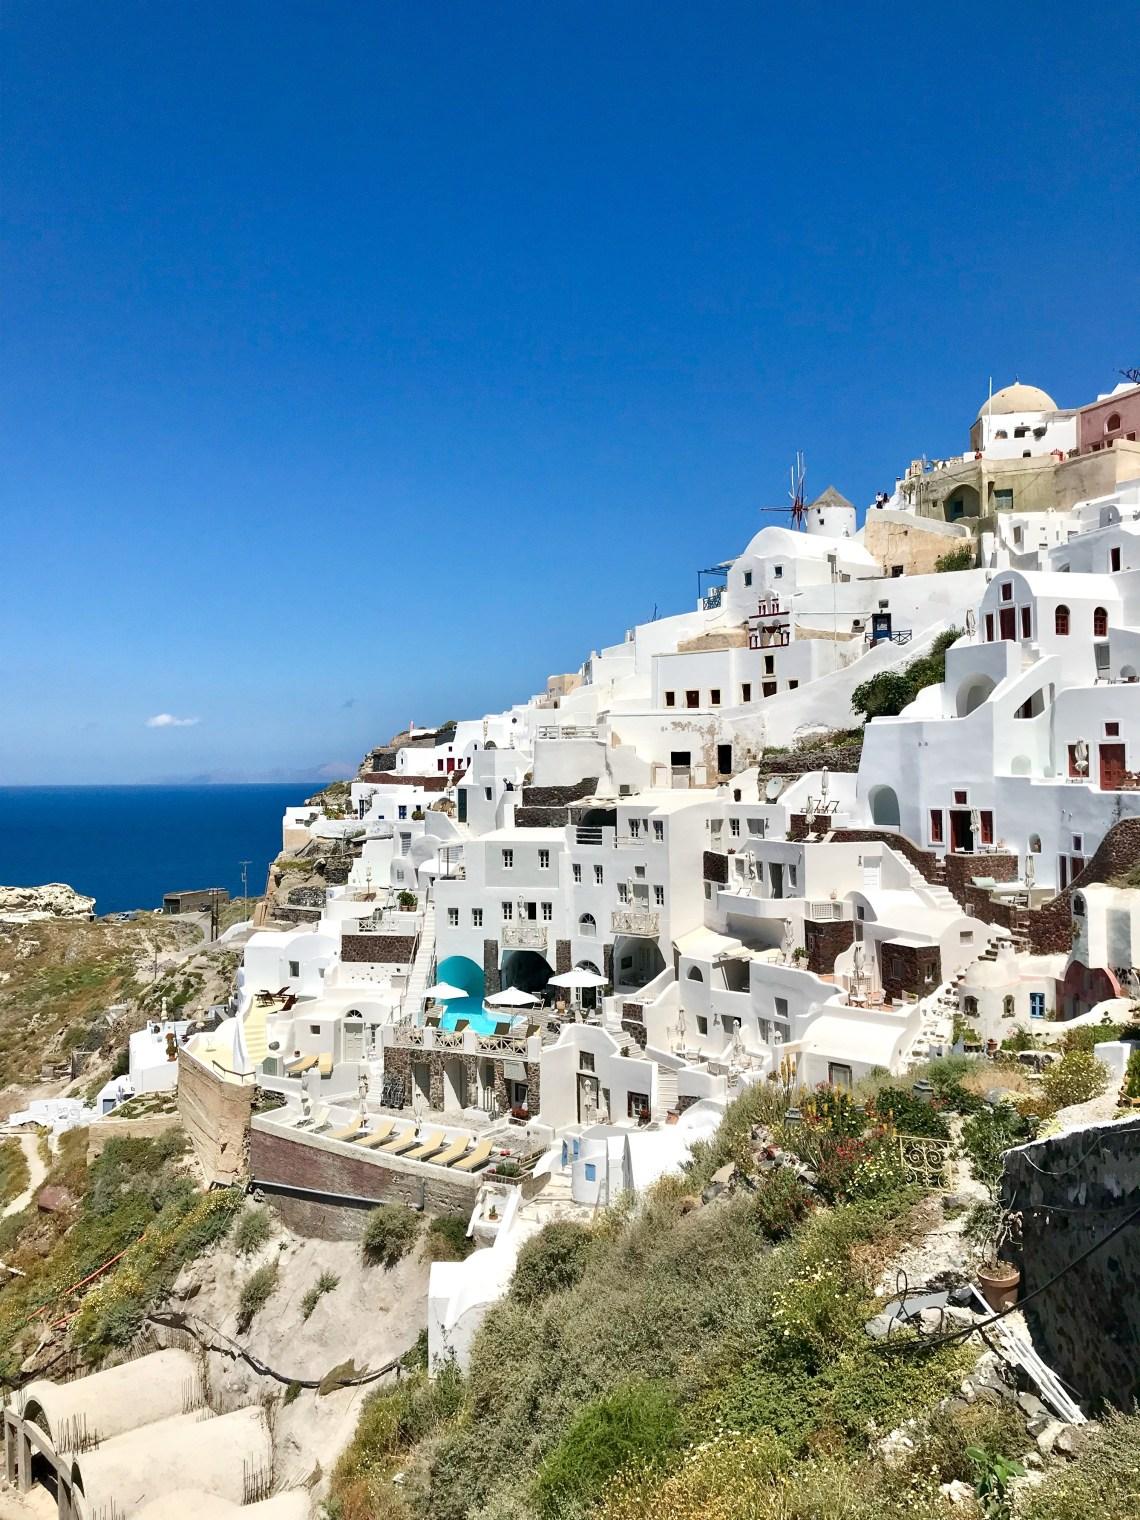 Oia Santorini travel guide